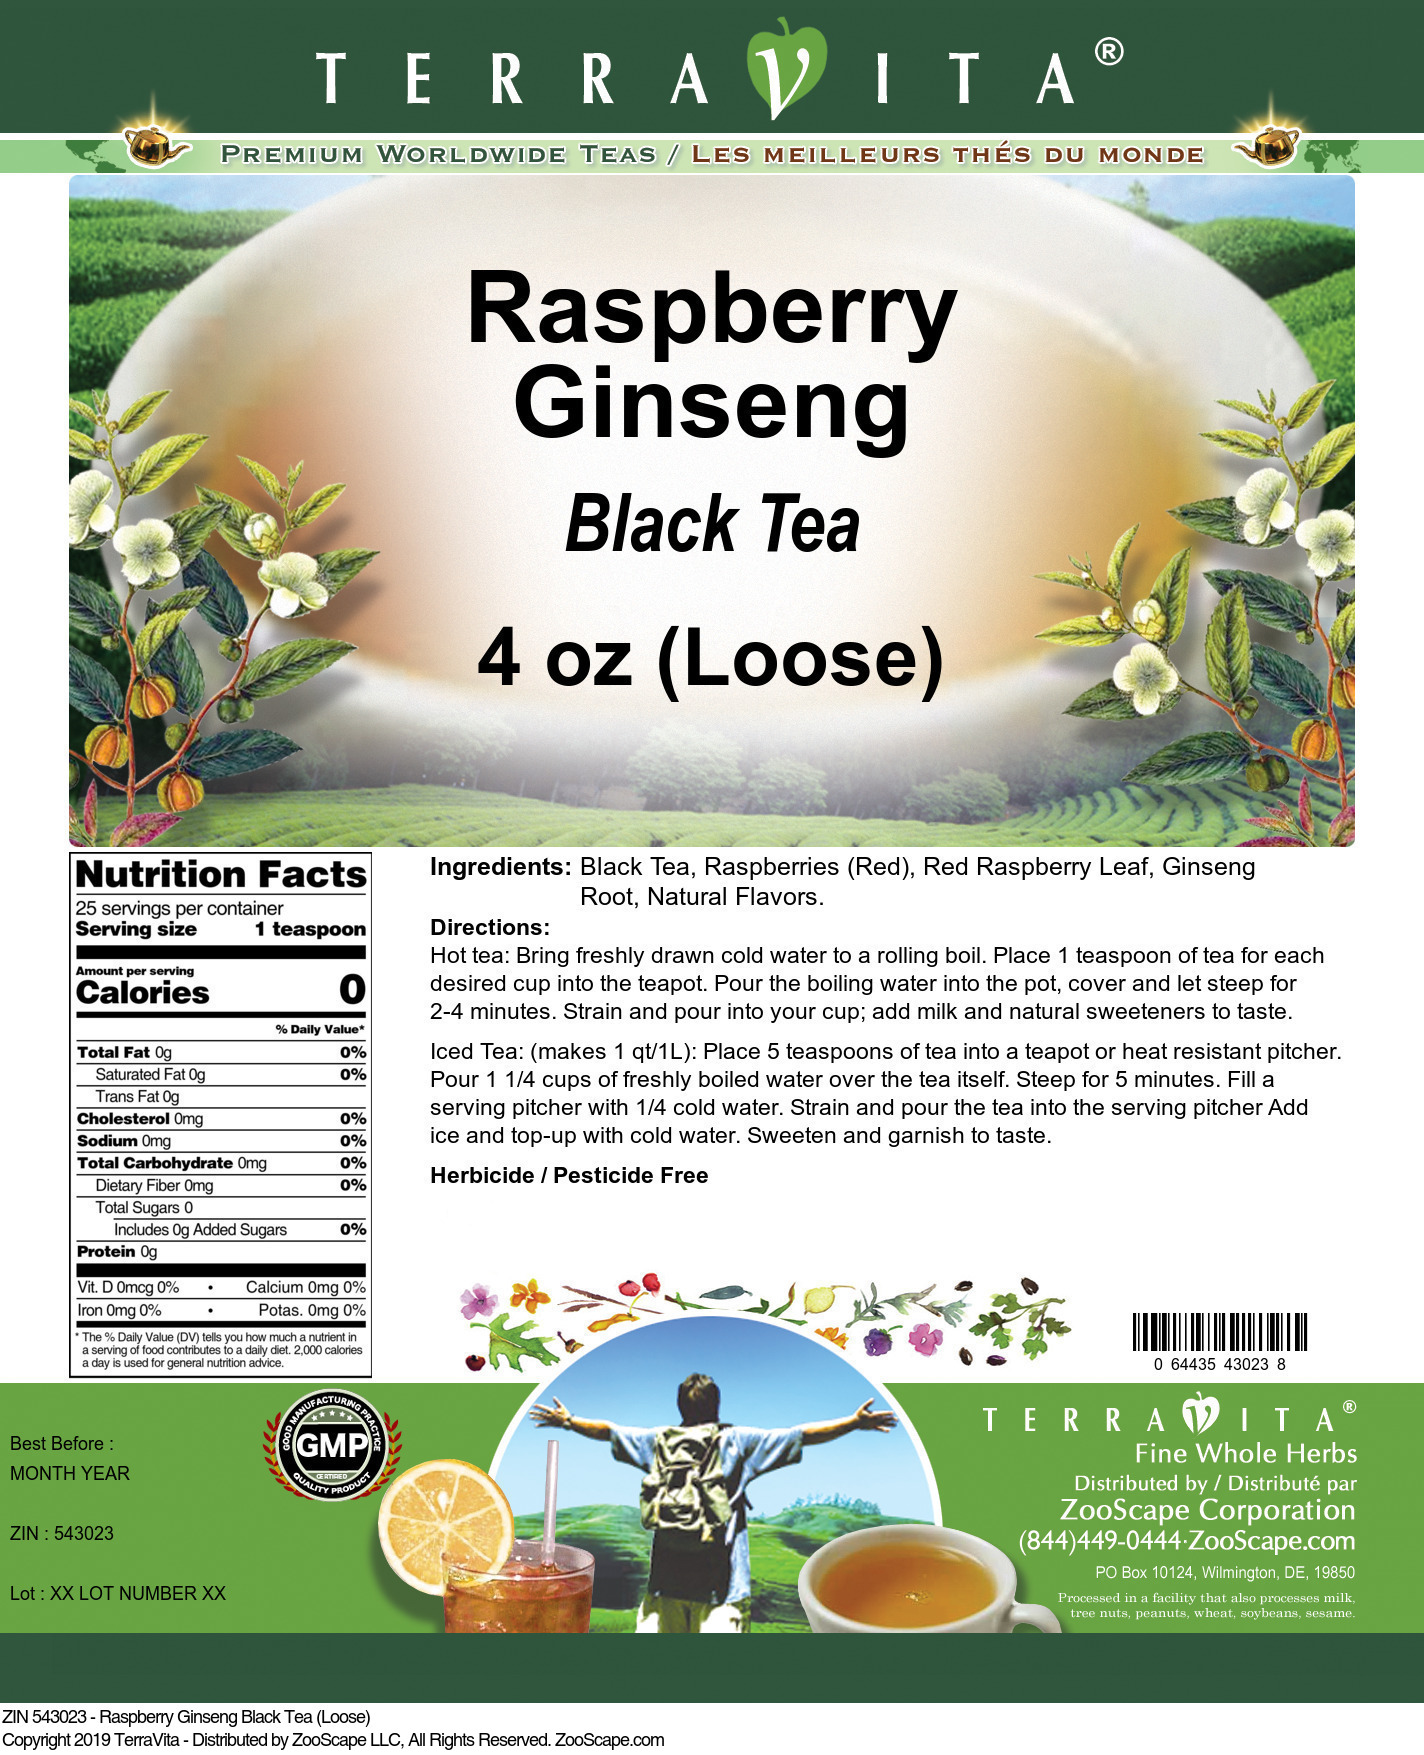 Raspberry Ginseng Black Tea